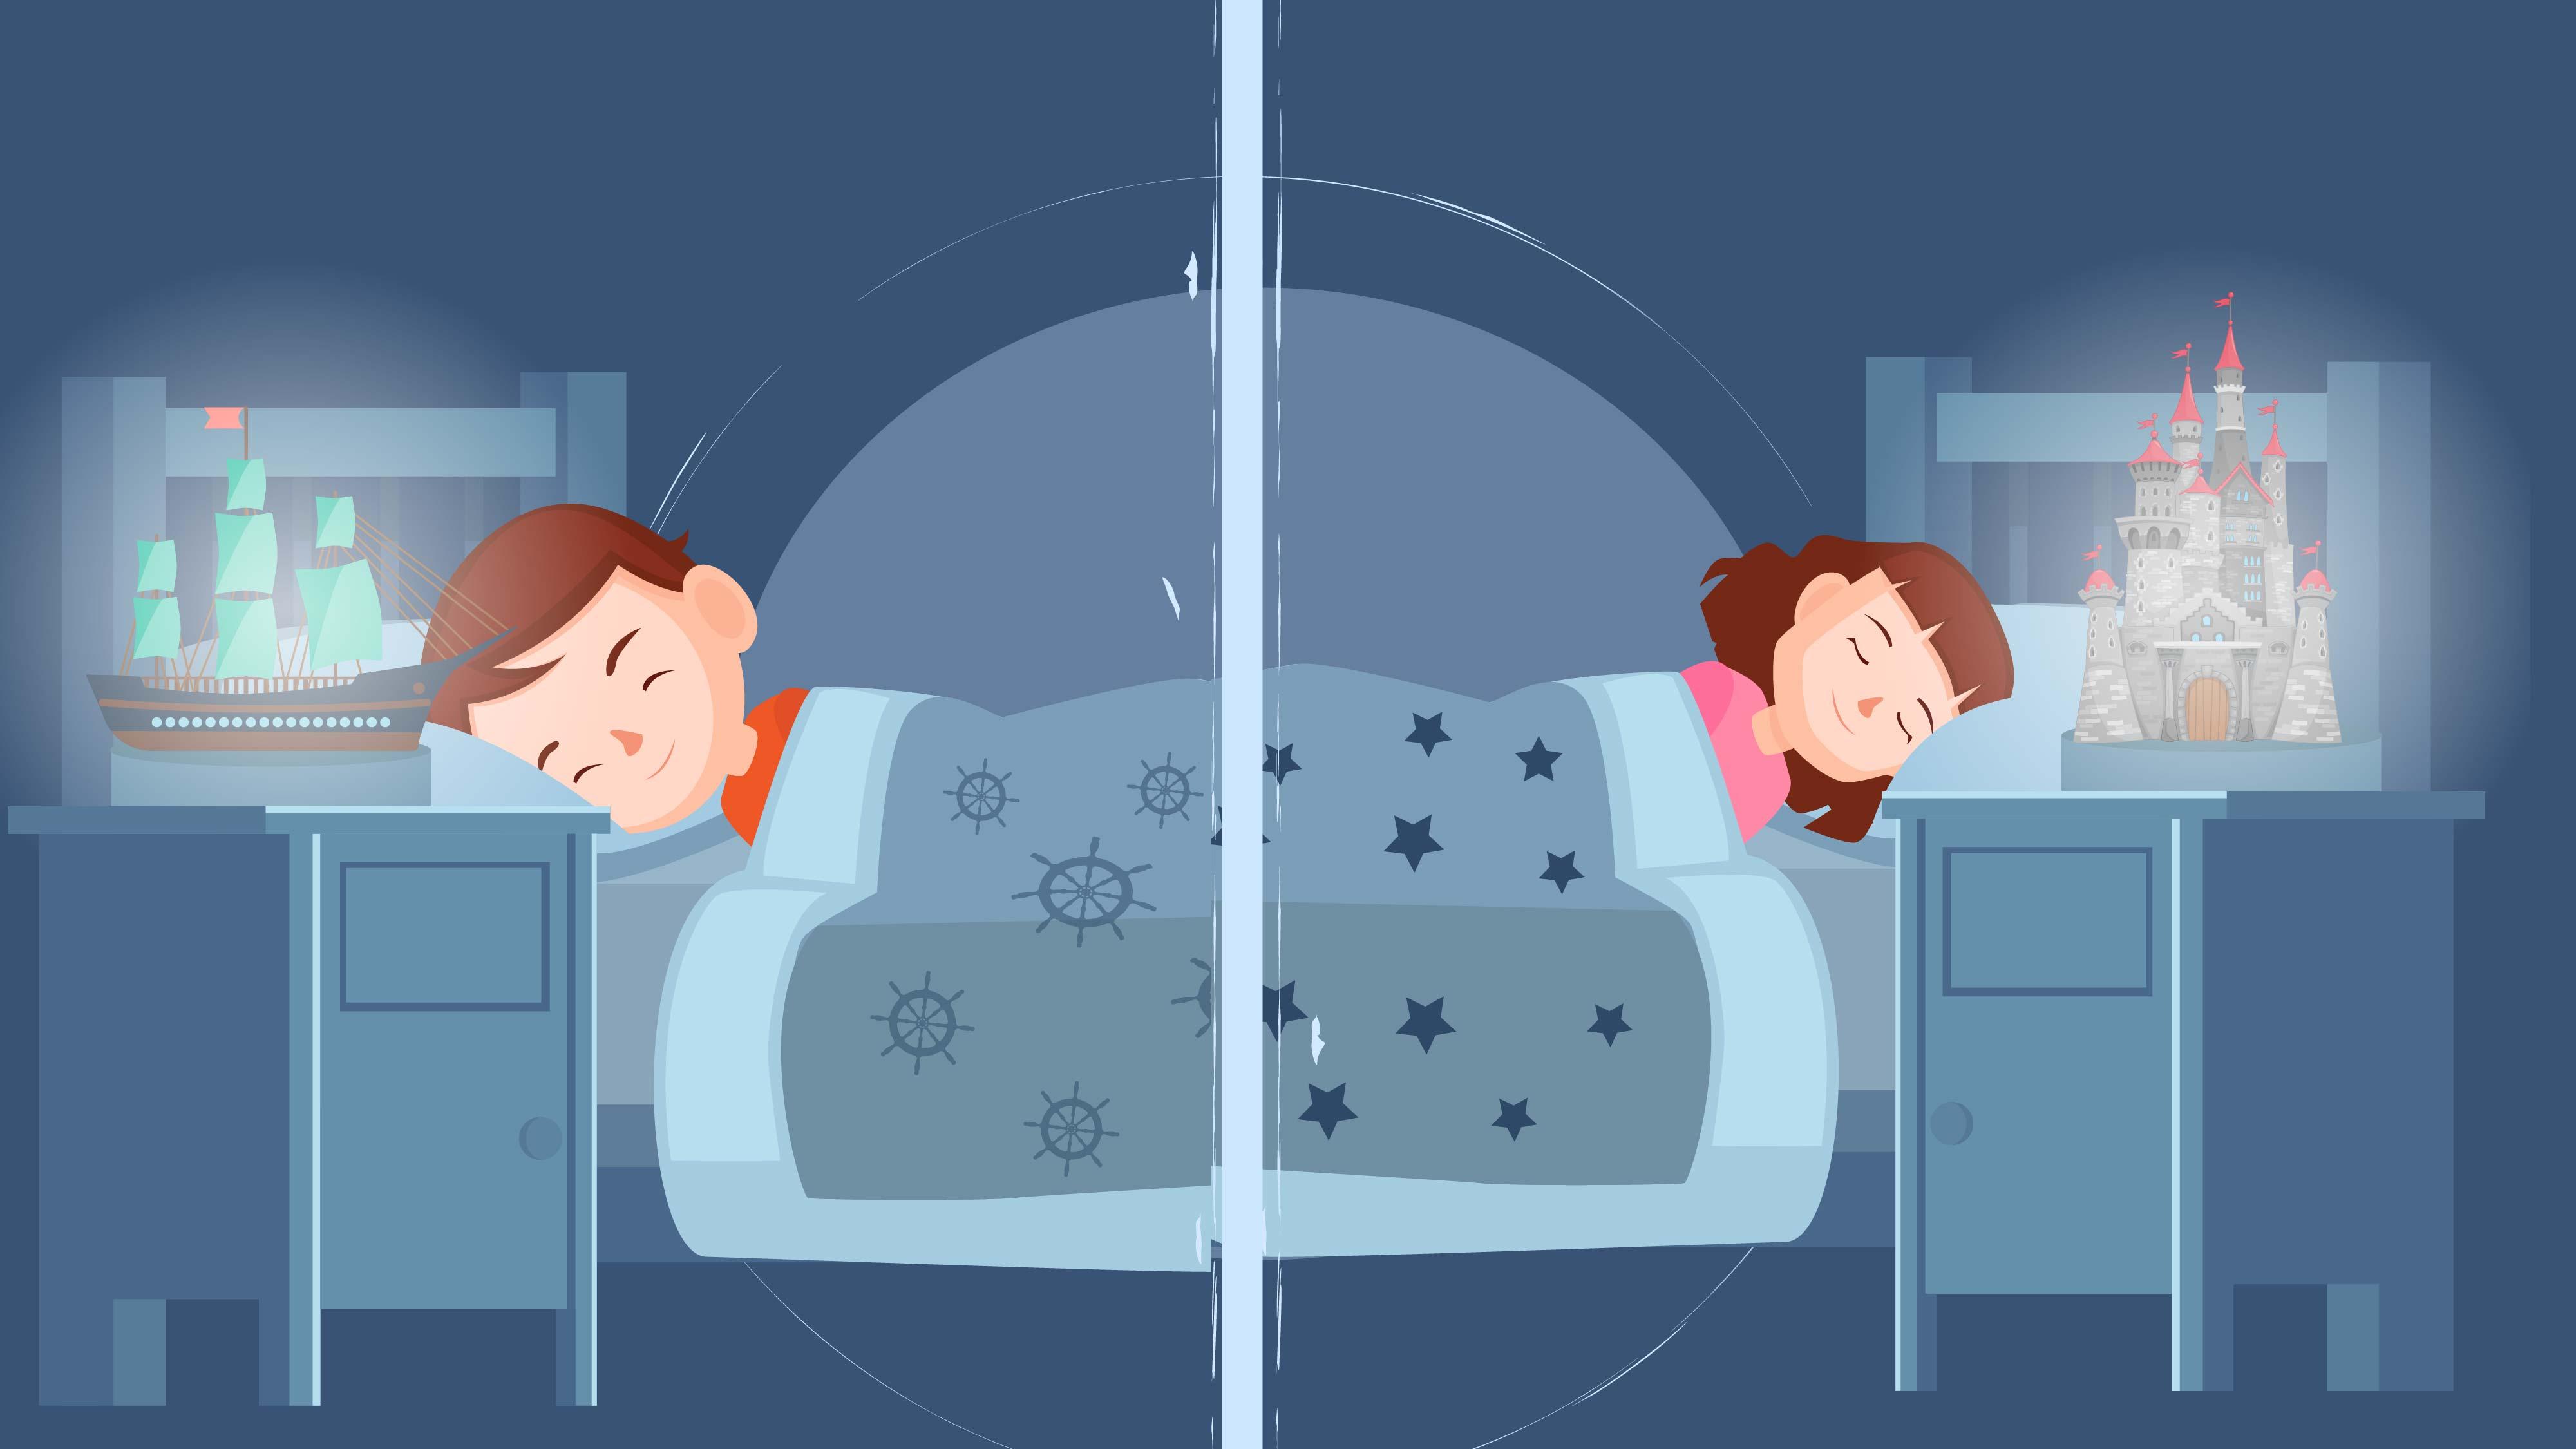 Kids are sleeping. Modern animation